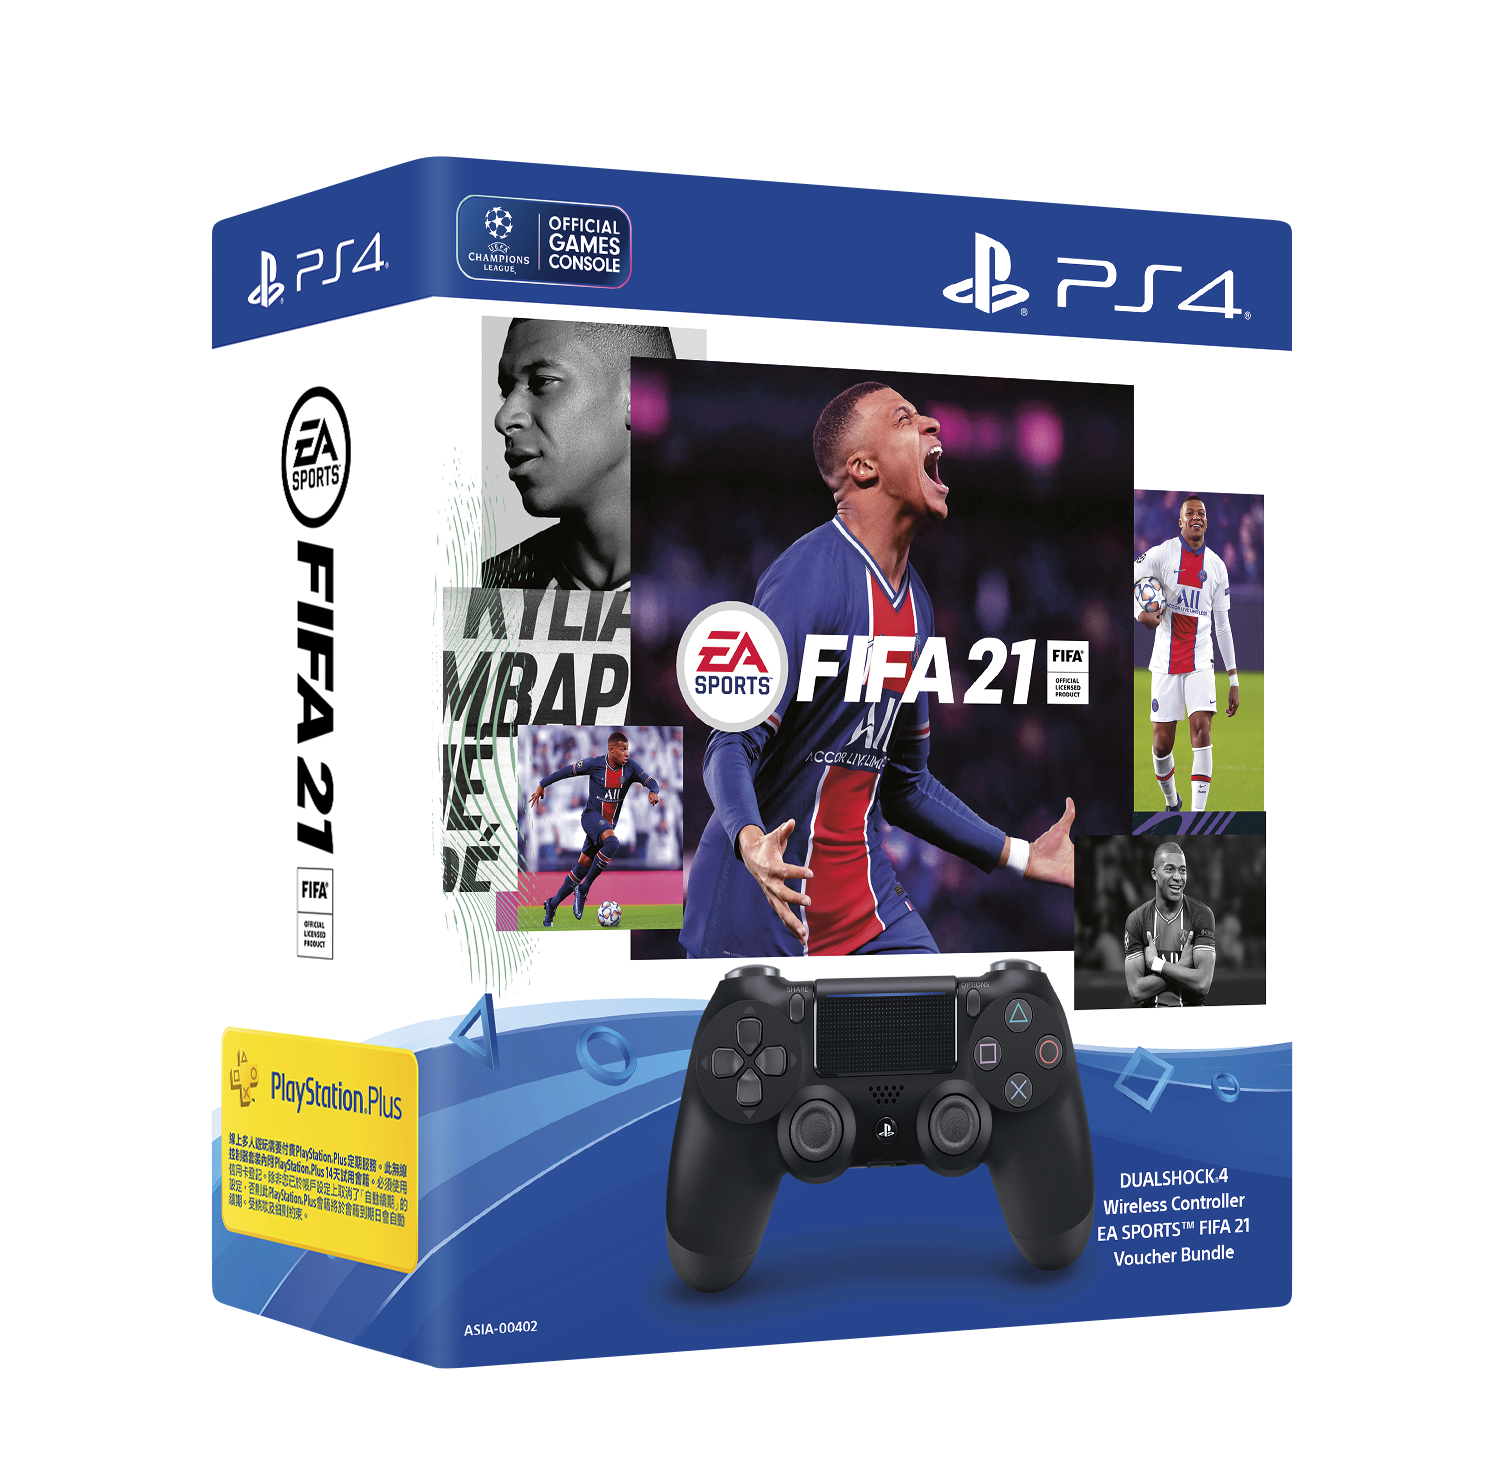 FIFA 21 DS4 組合包影像